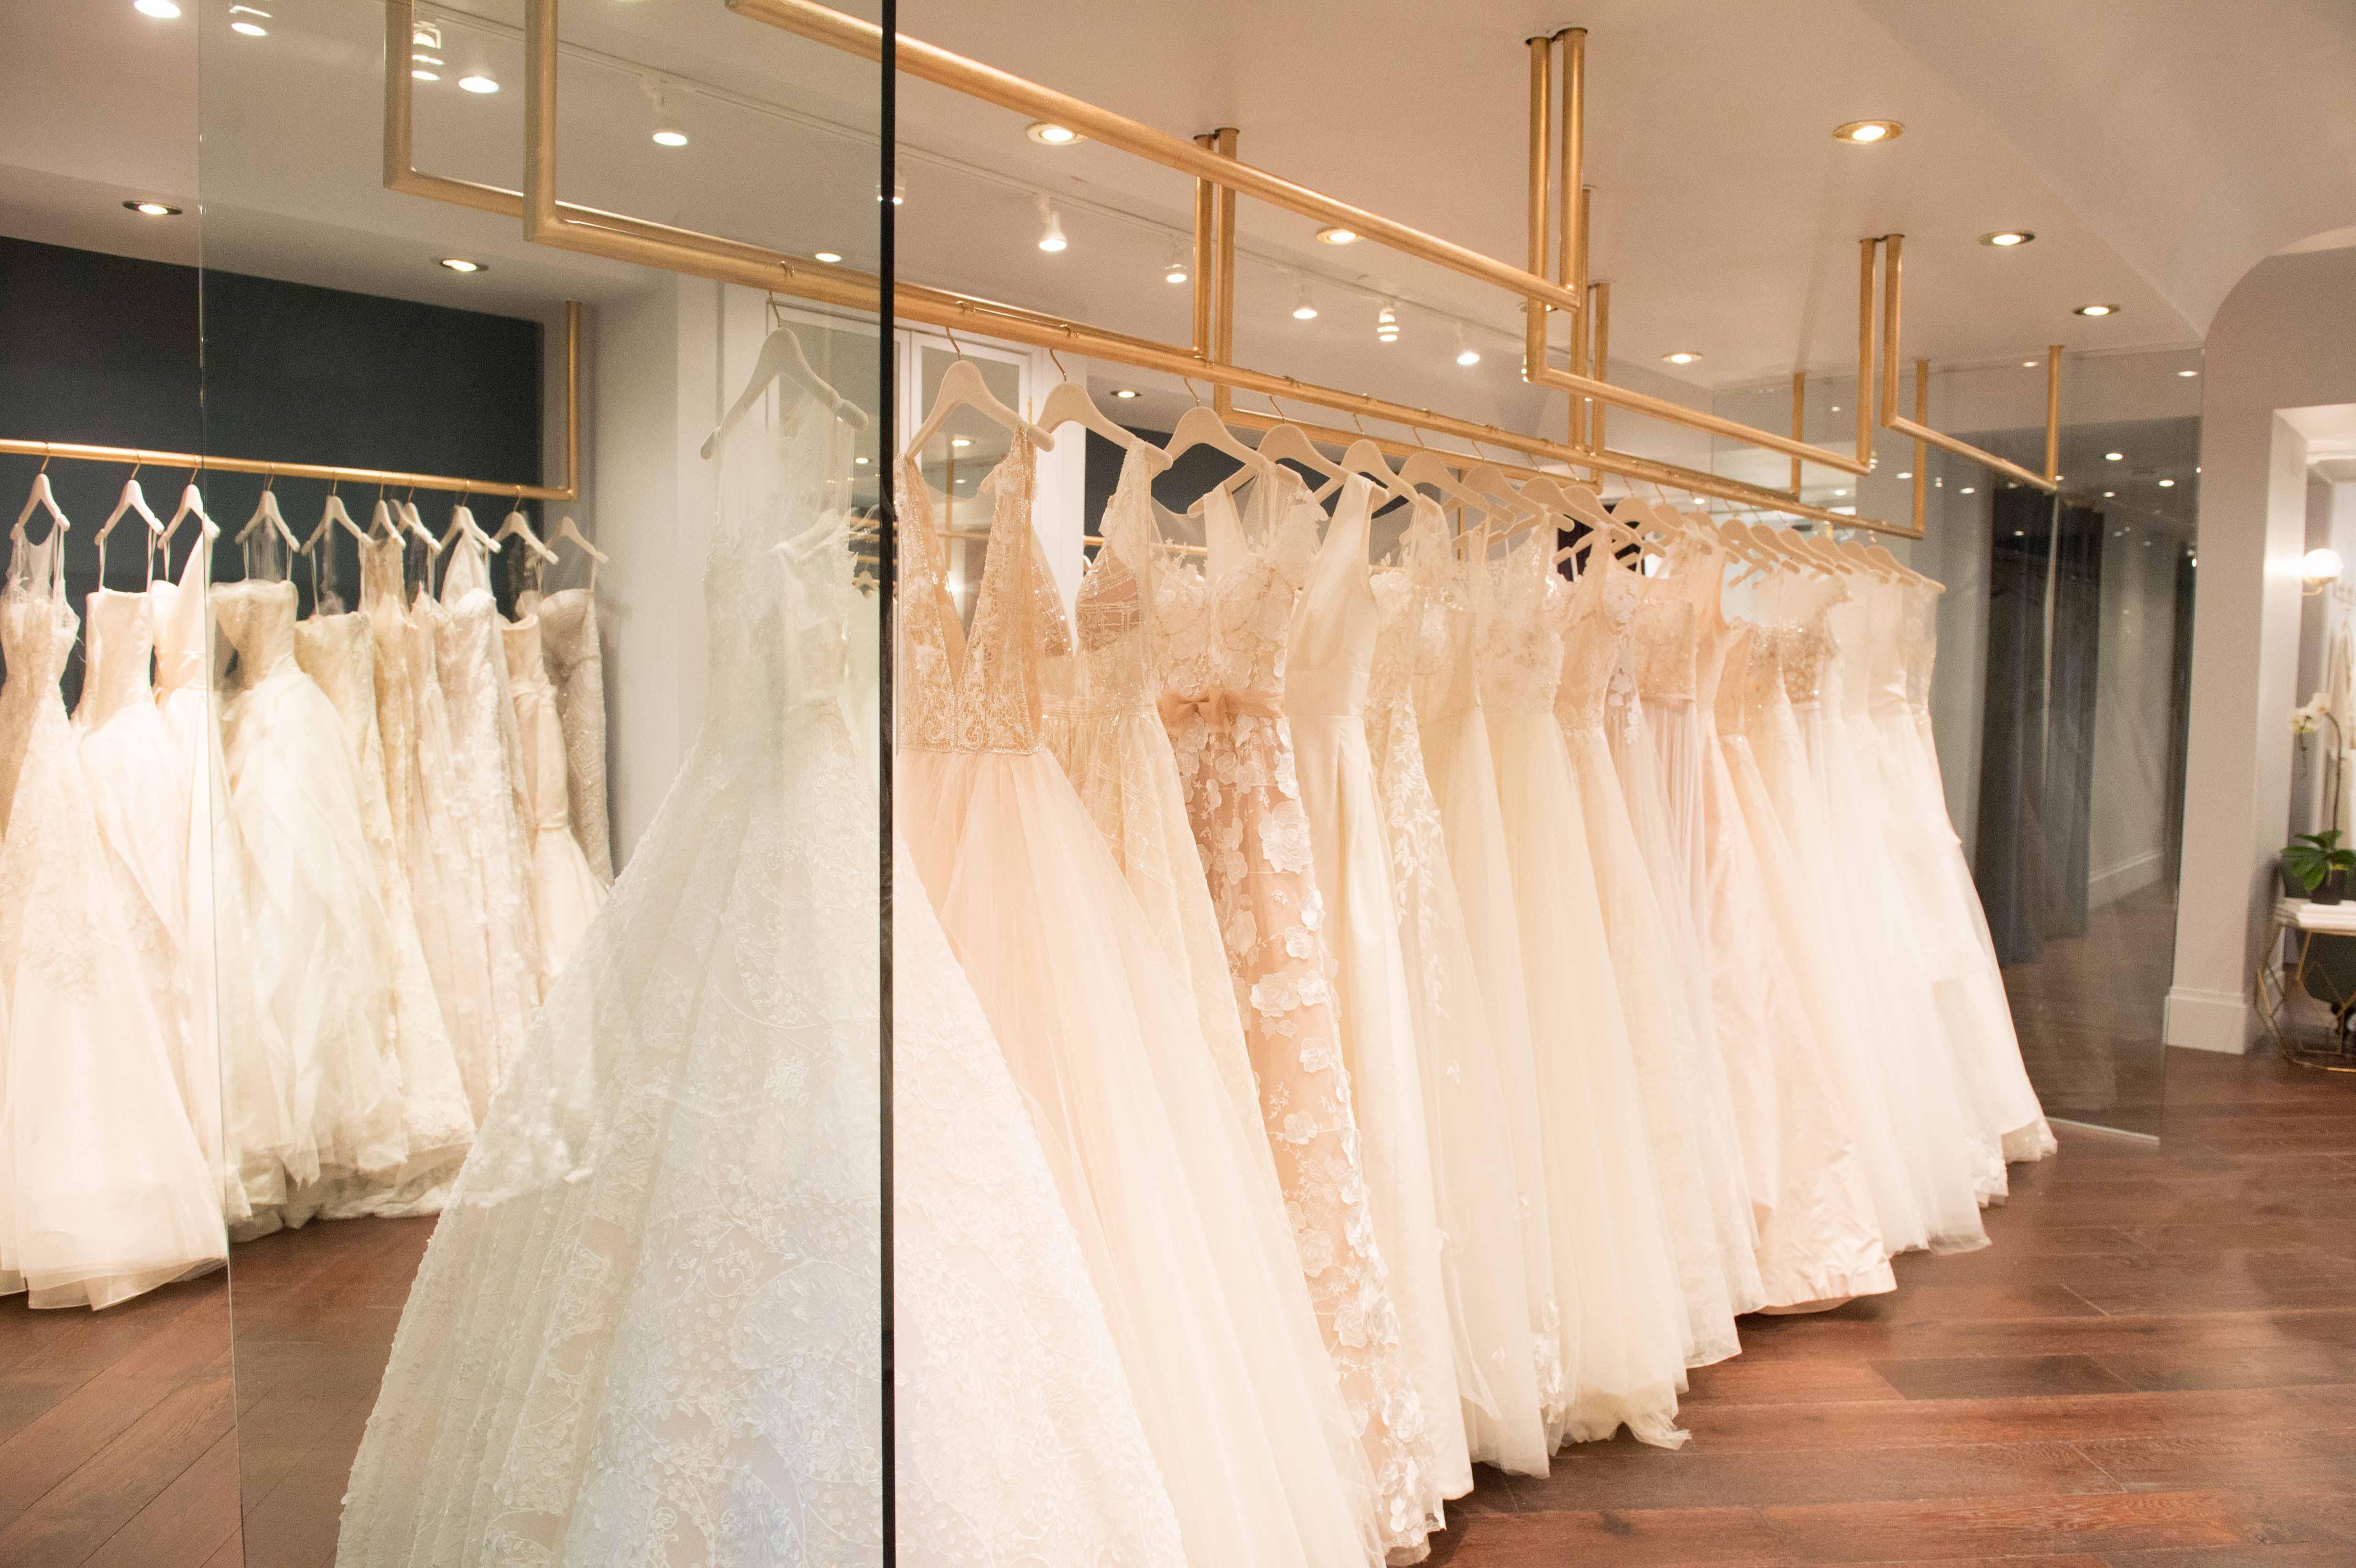 Carine's Bridal Atelier bridal salon wedding dresses in Washington, DC D.C. district of columbia